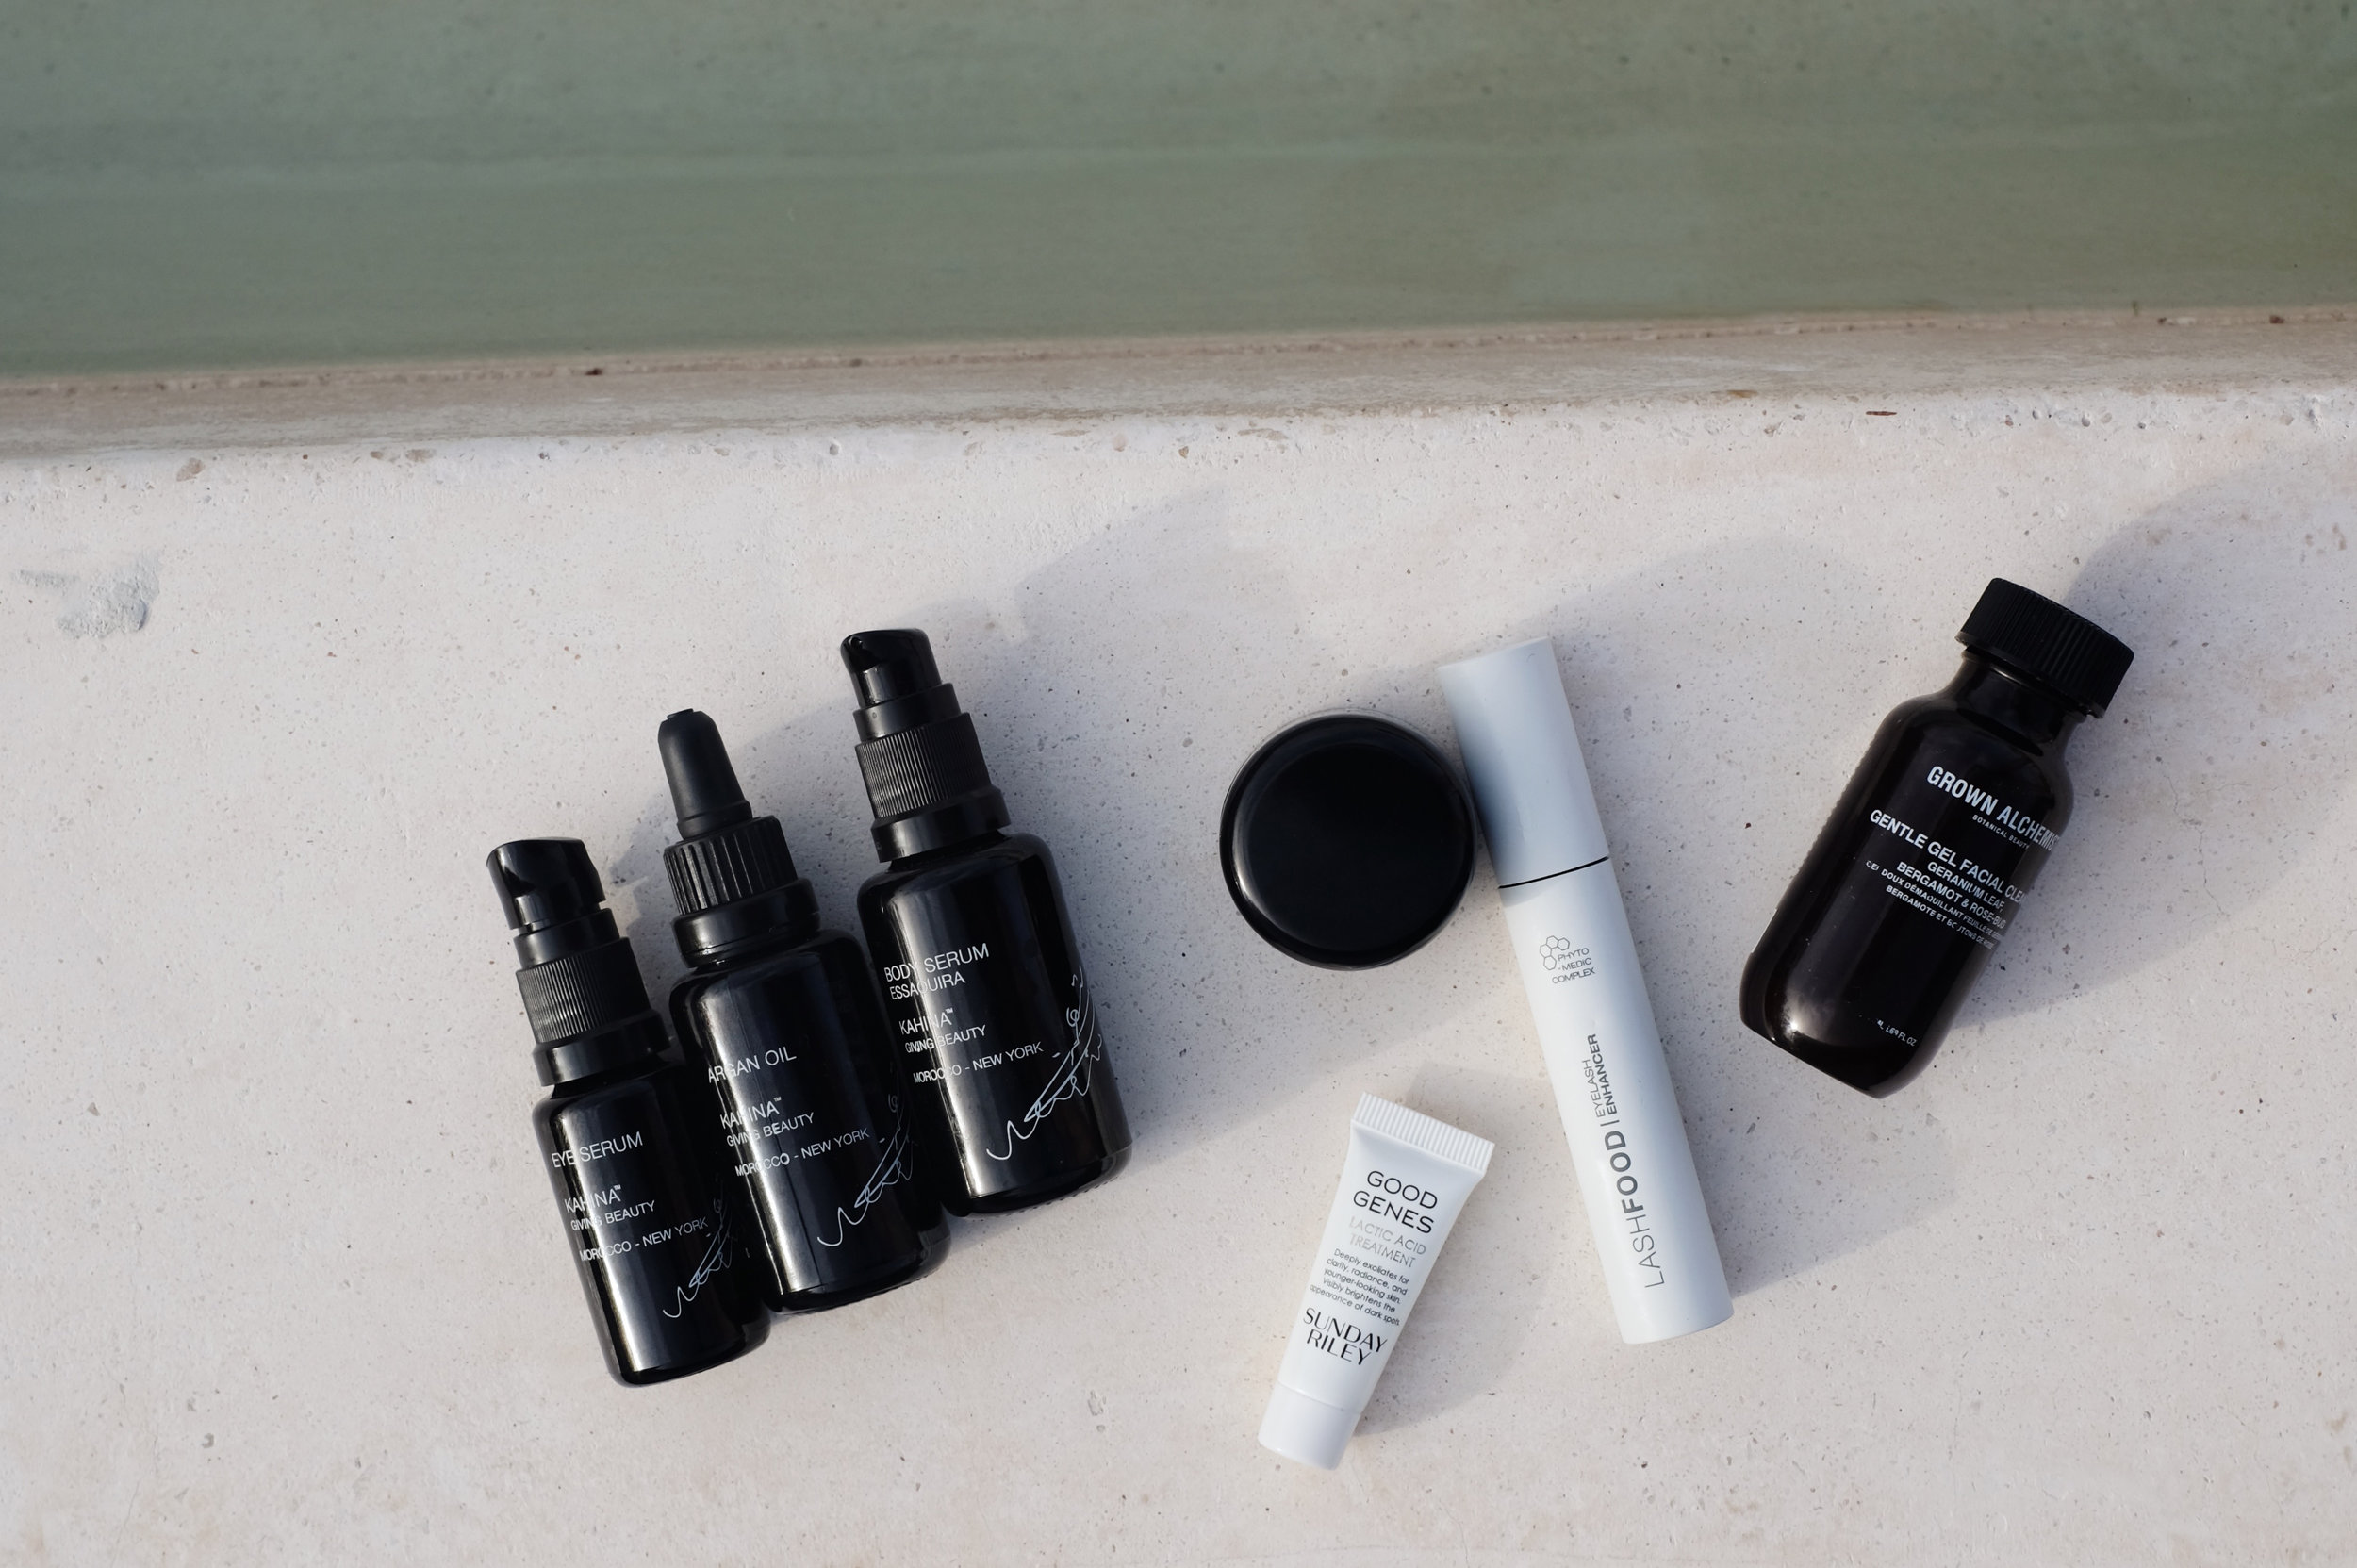 KAHINA GIVING BEAUTY    Eye Serum  ,   Argan Oil  ,   Body Serum  ,   Eye Cream   / SUNDAY RILEY   Good Genes   / LASHFOOD   Serum  / GROWN ALCHEMIST   Gentle Facial Cleanser